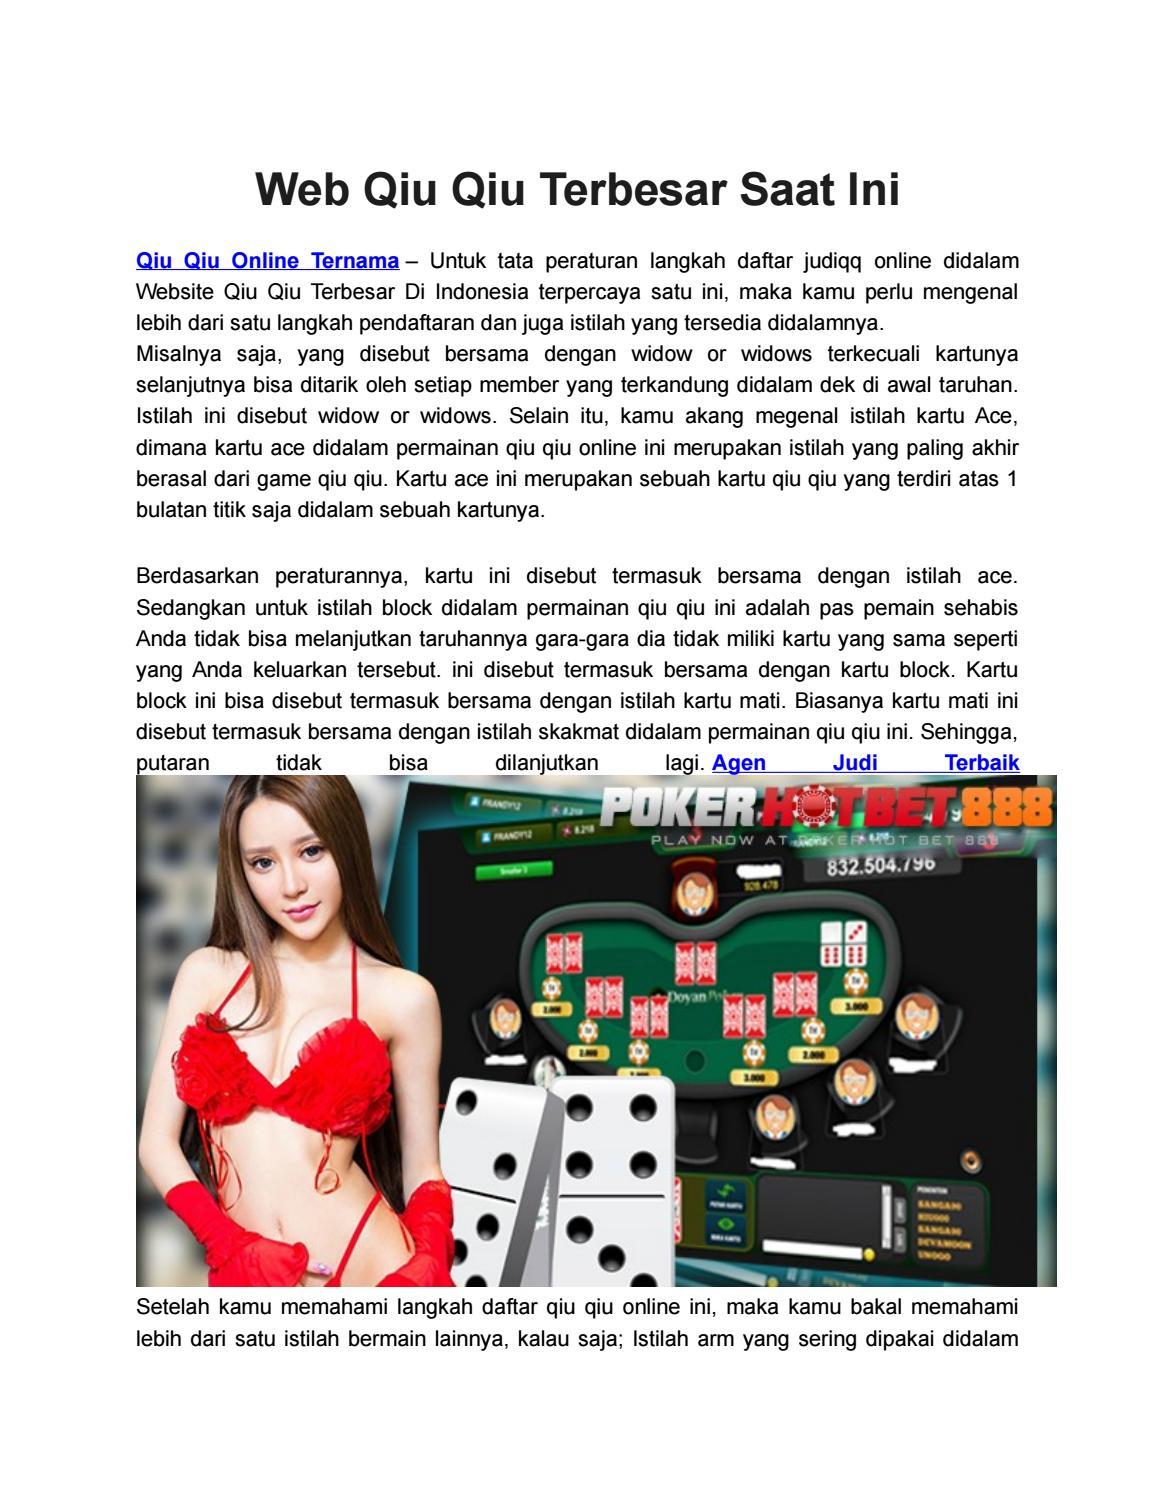 Web Qiu Qiu Terbesar Saat Ini By Claudia Tan Issuu